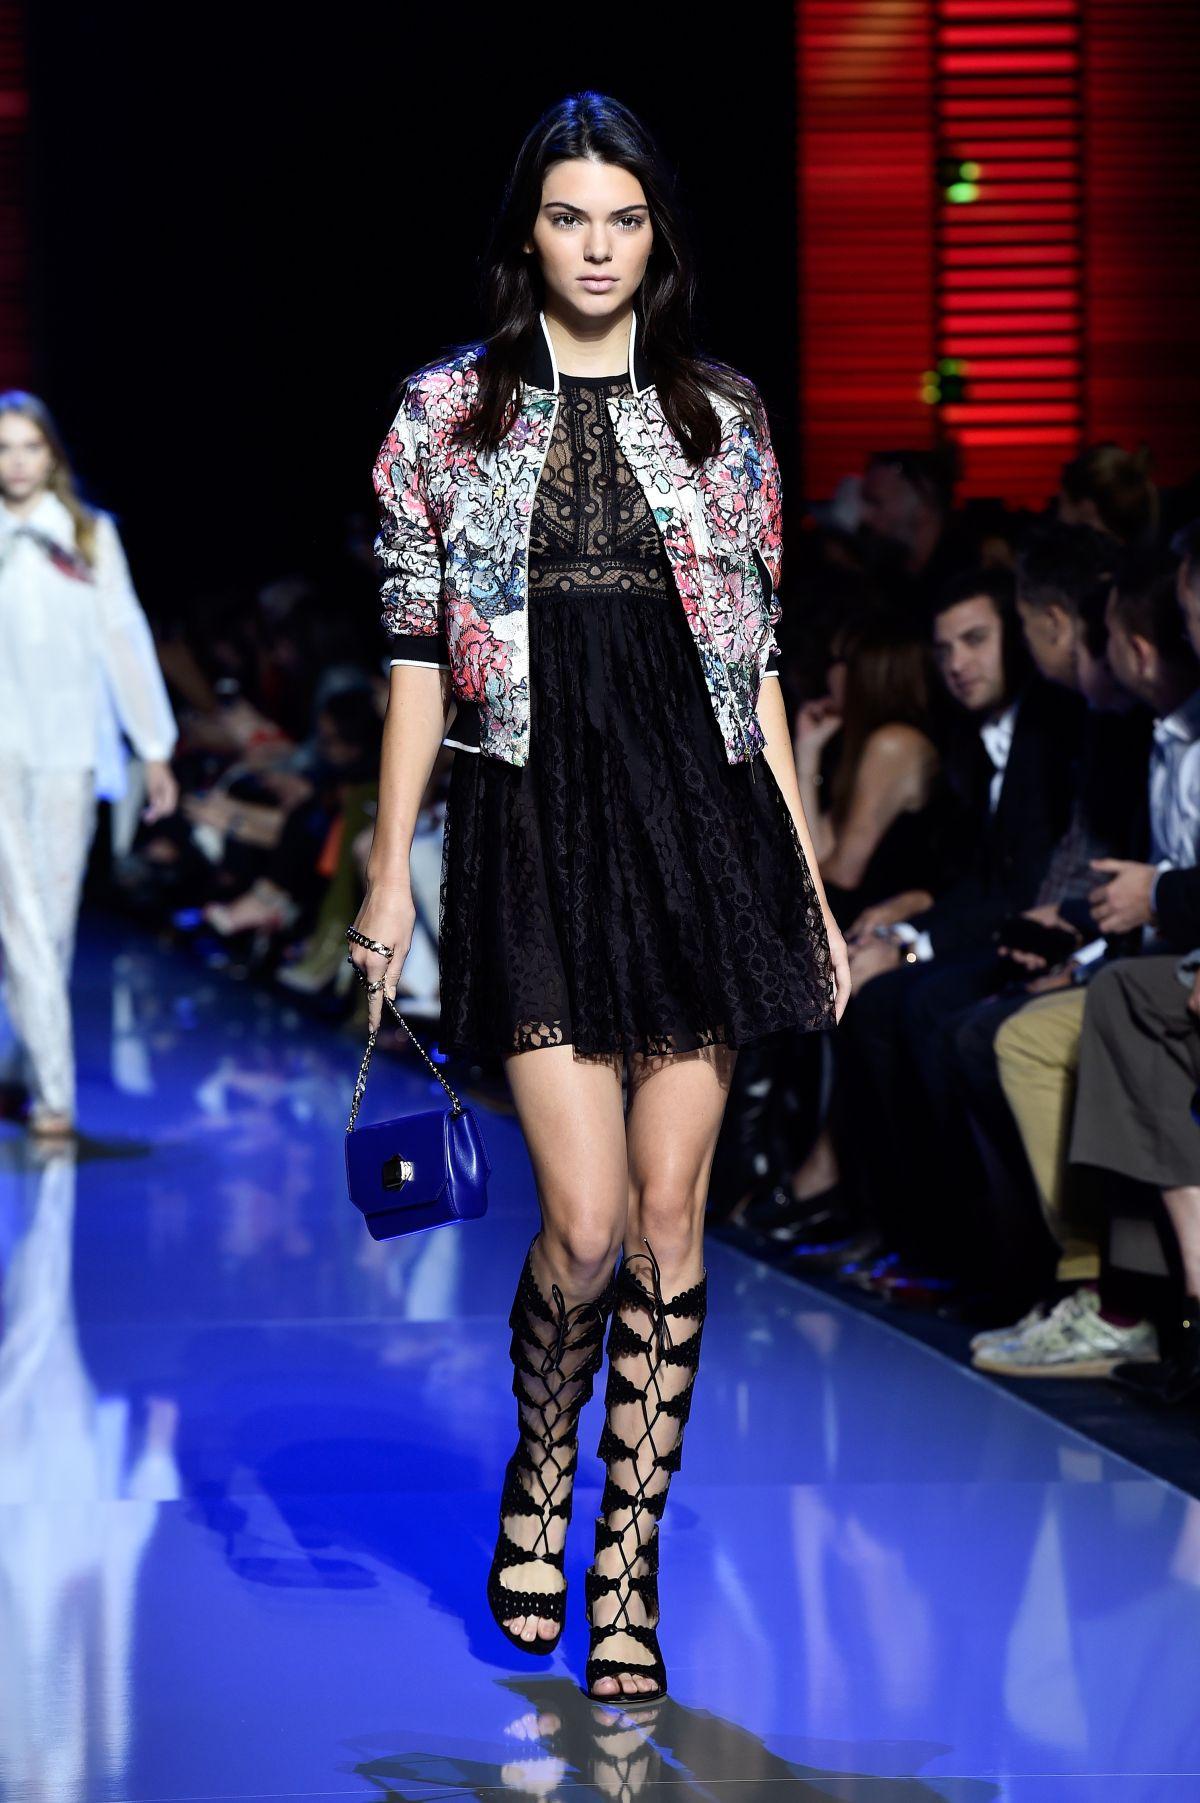 Andre kim fashion show 2